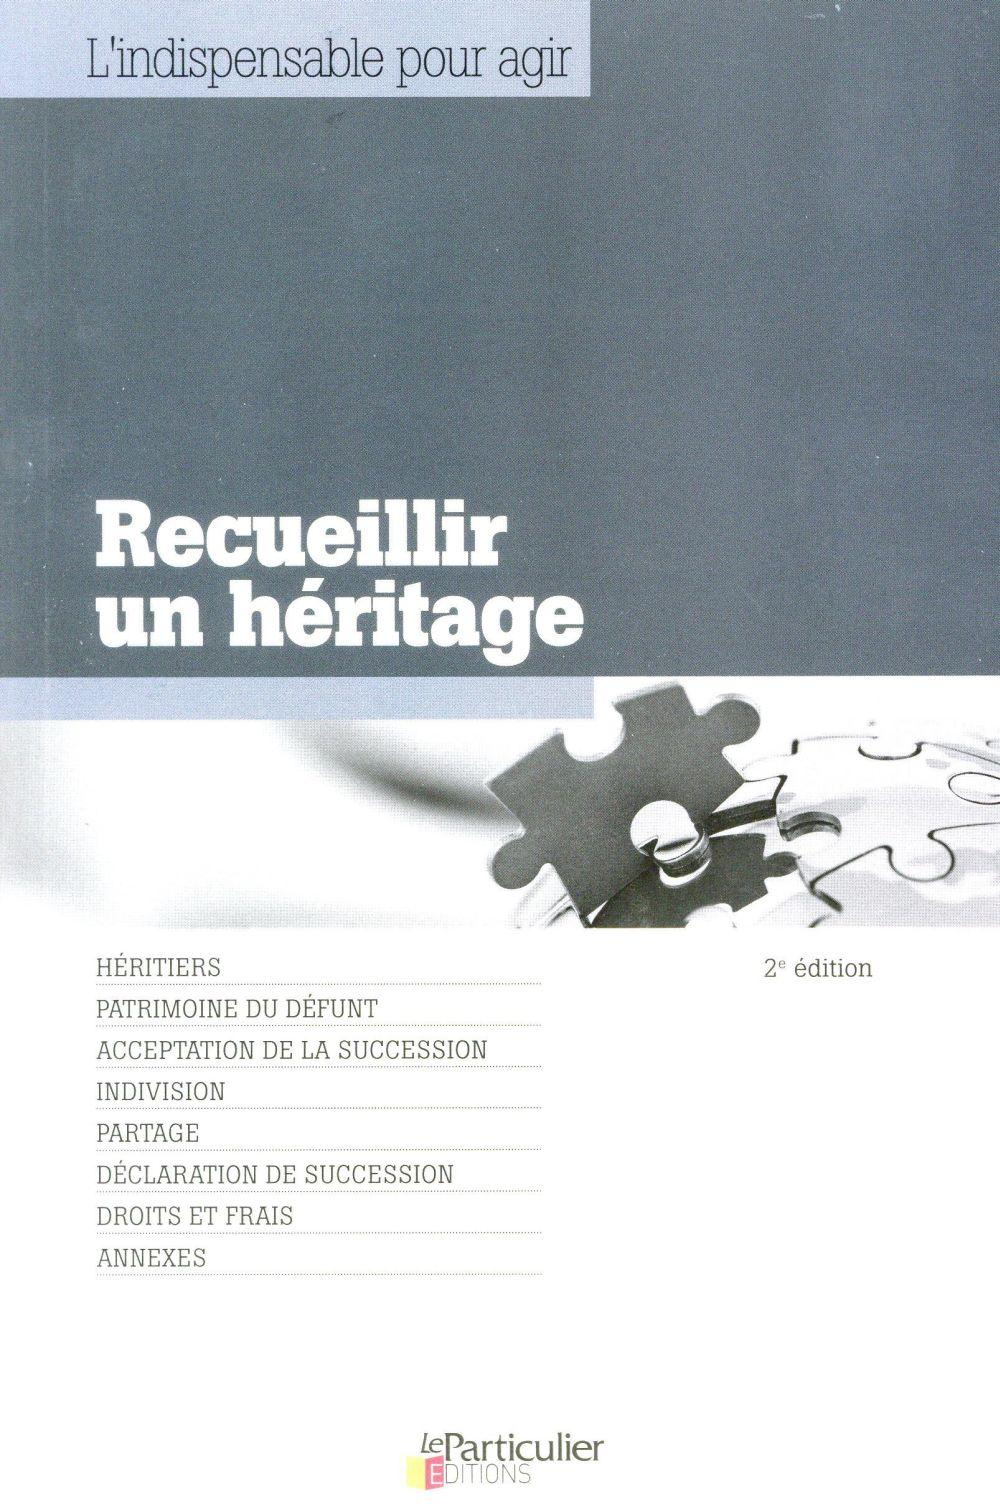 RECUEILLIR UN HERITAGE  2E EDITION - HERITIERS. PATRIMOINE DU DEFUNT. ACCEPTATION DE LA SUCCESSION.